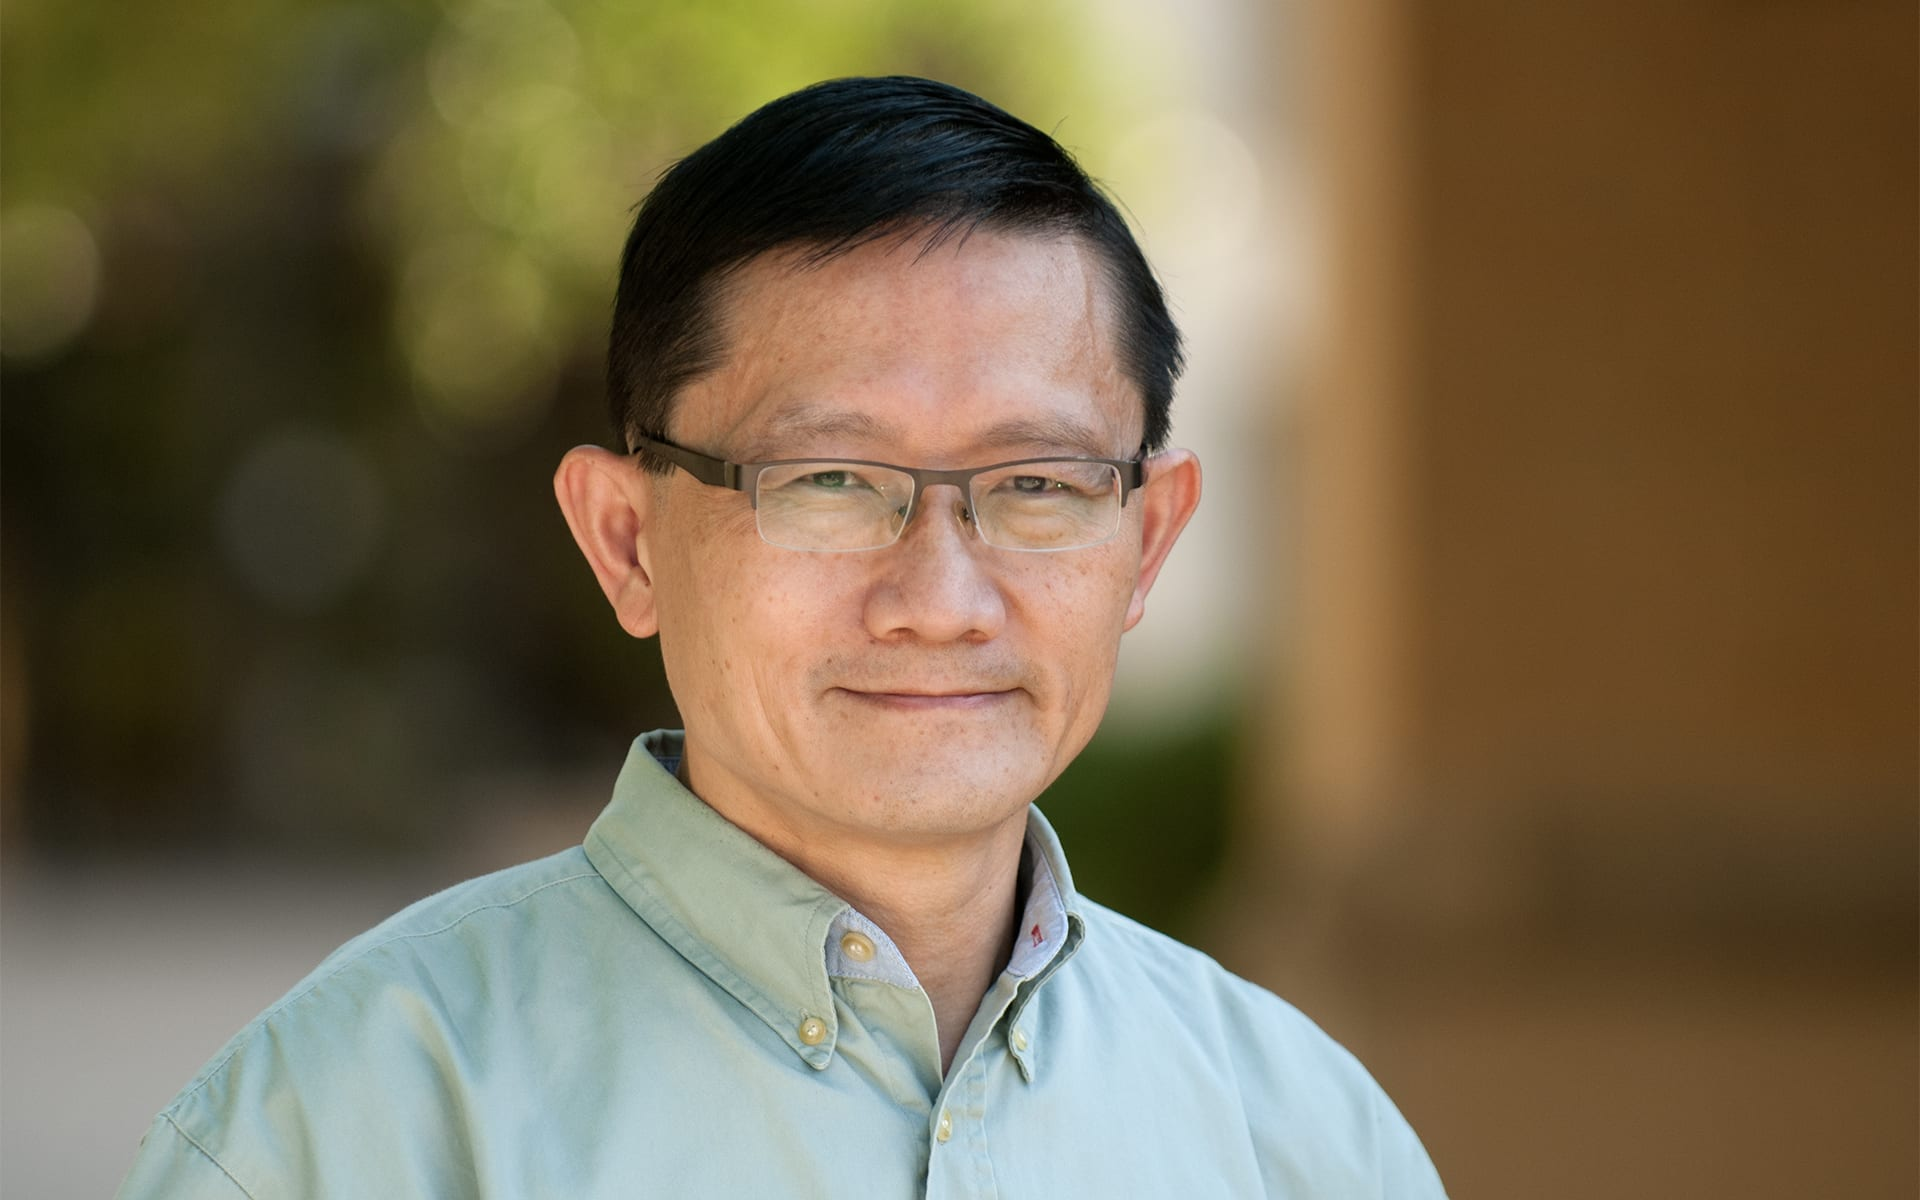 Richard Hon